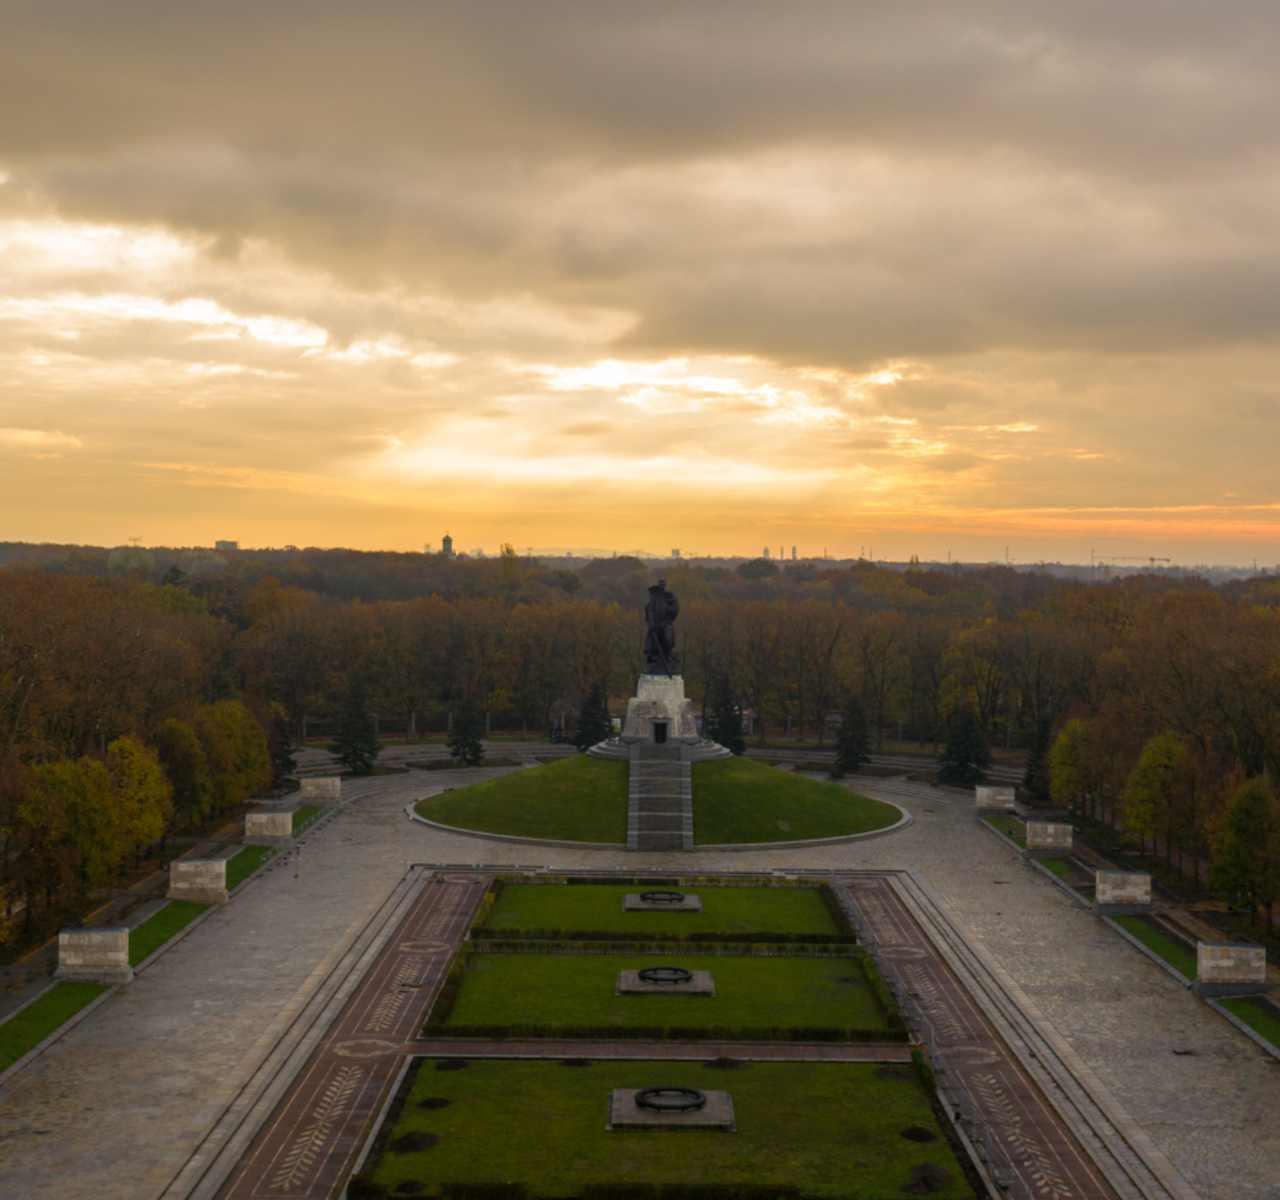 https://drohne-berlin.com/wp-content/uploads/2020/12/Park-Denkmal.jpg